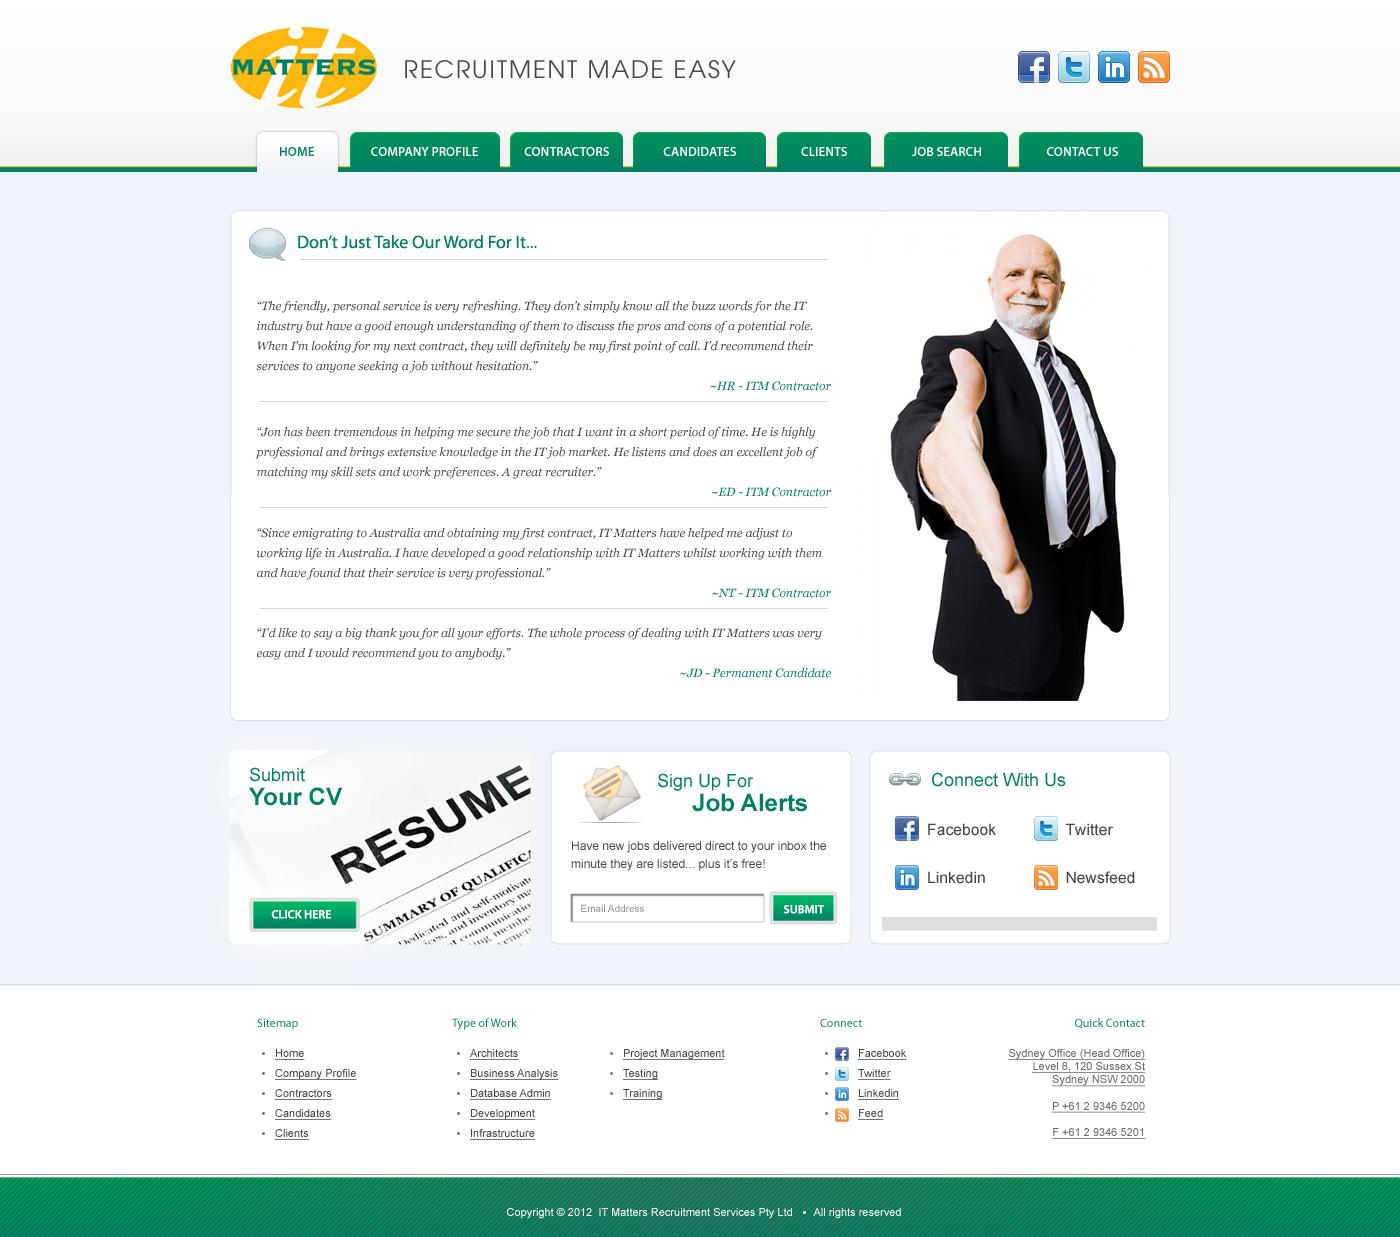 IT Matters needs a new website design for 2012